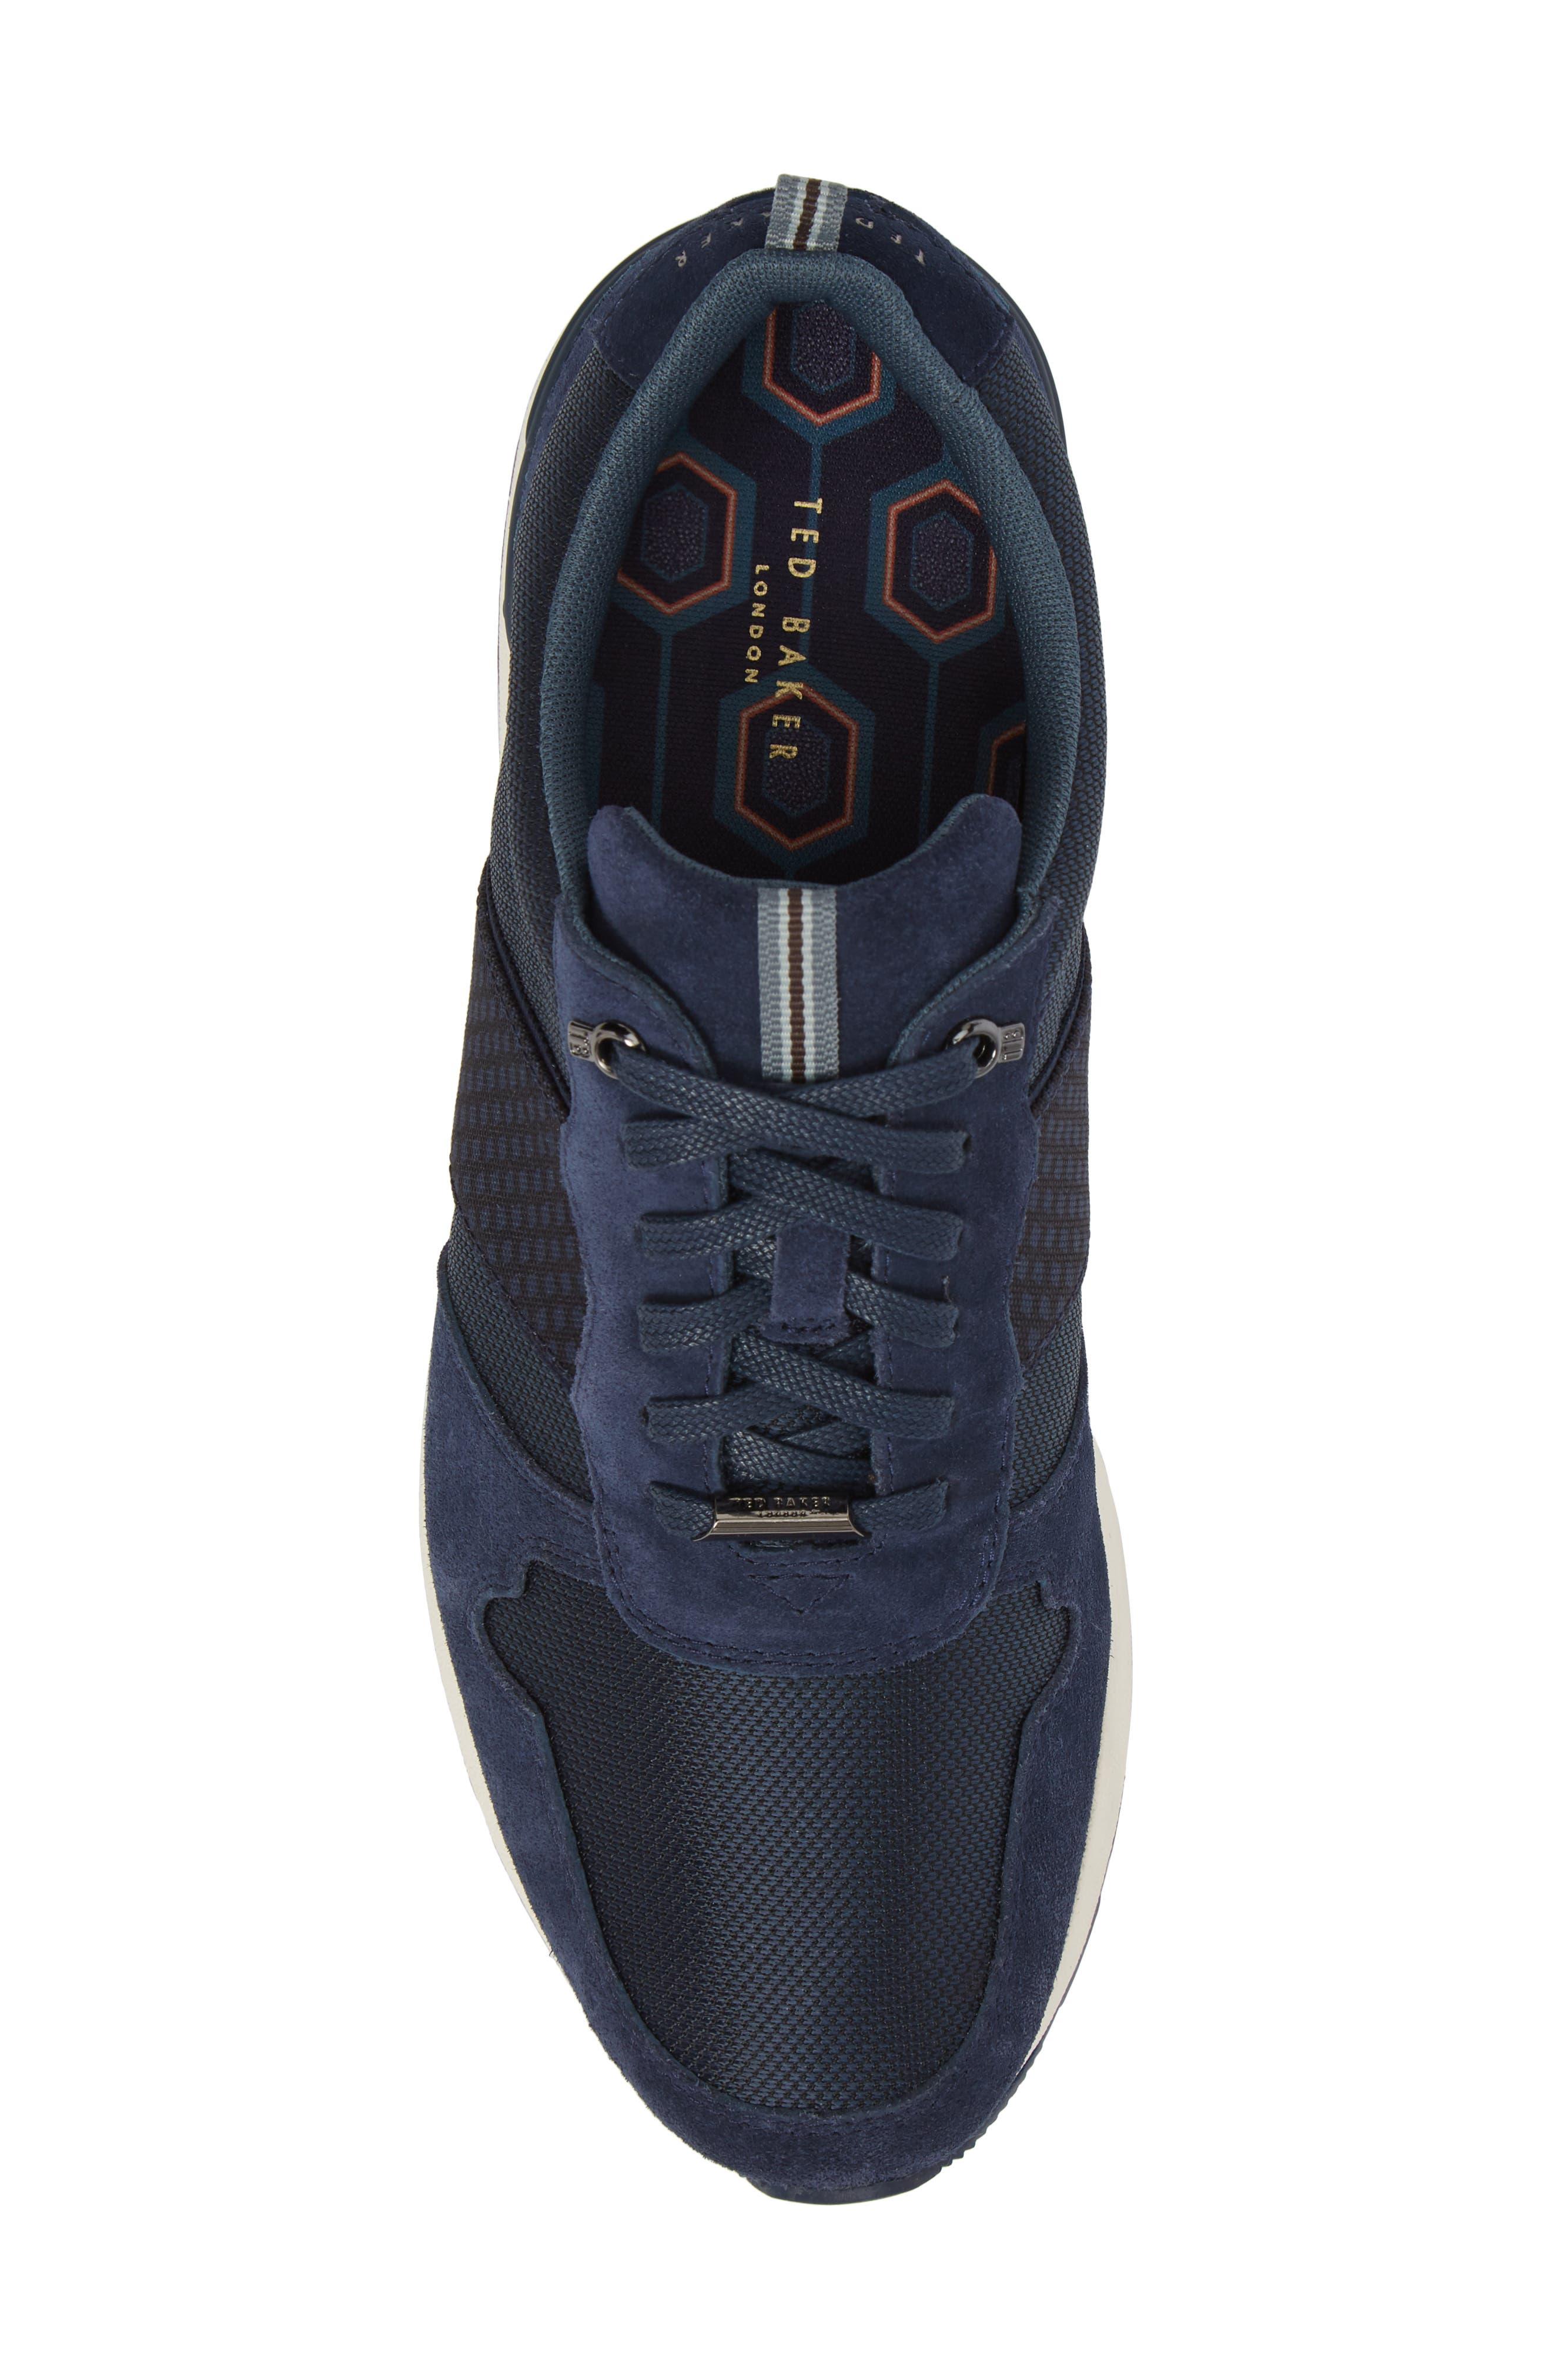 Hebey Lace-Up Sneaker,                             Alternate thumbnail 5, color,                             DARK BLUE TEXTILE